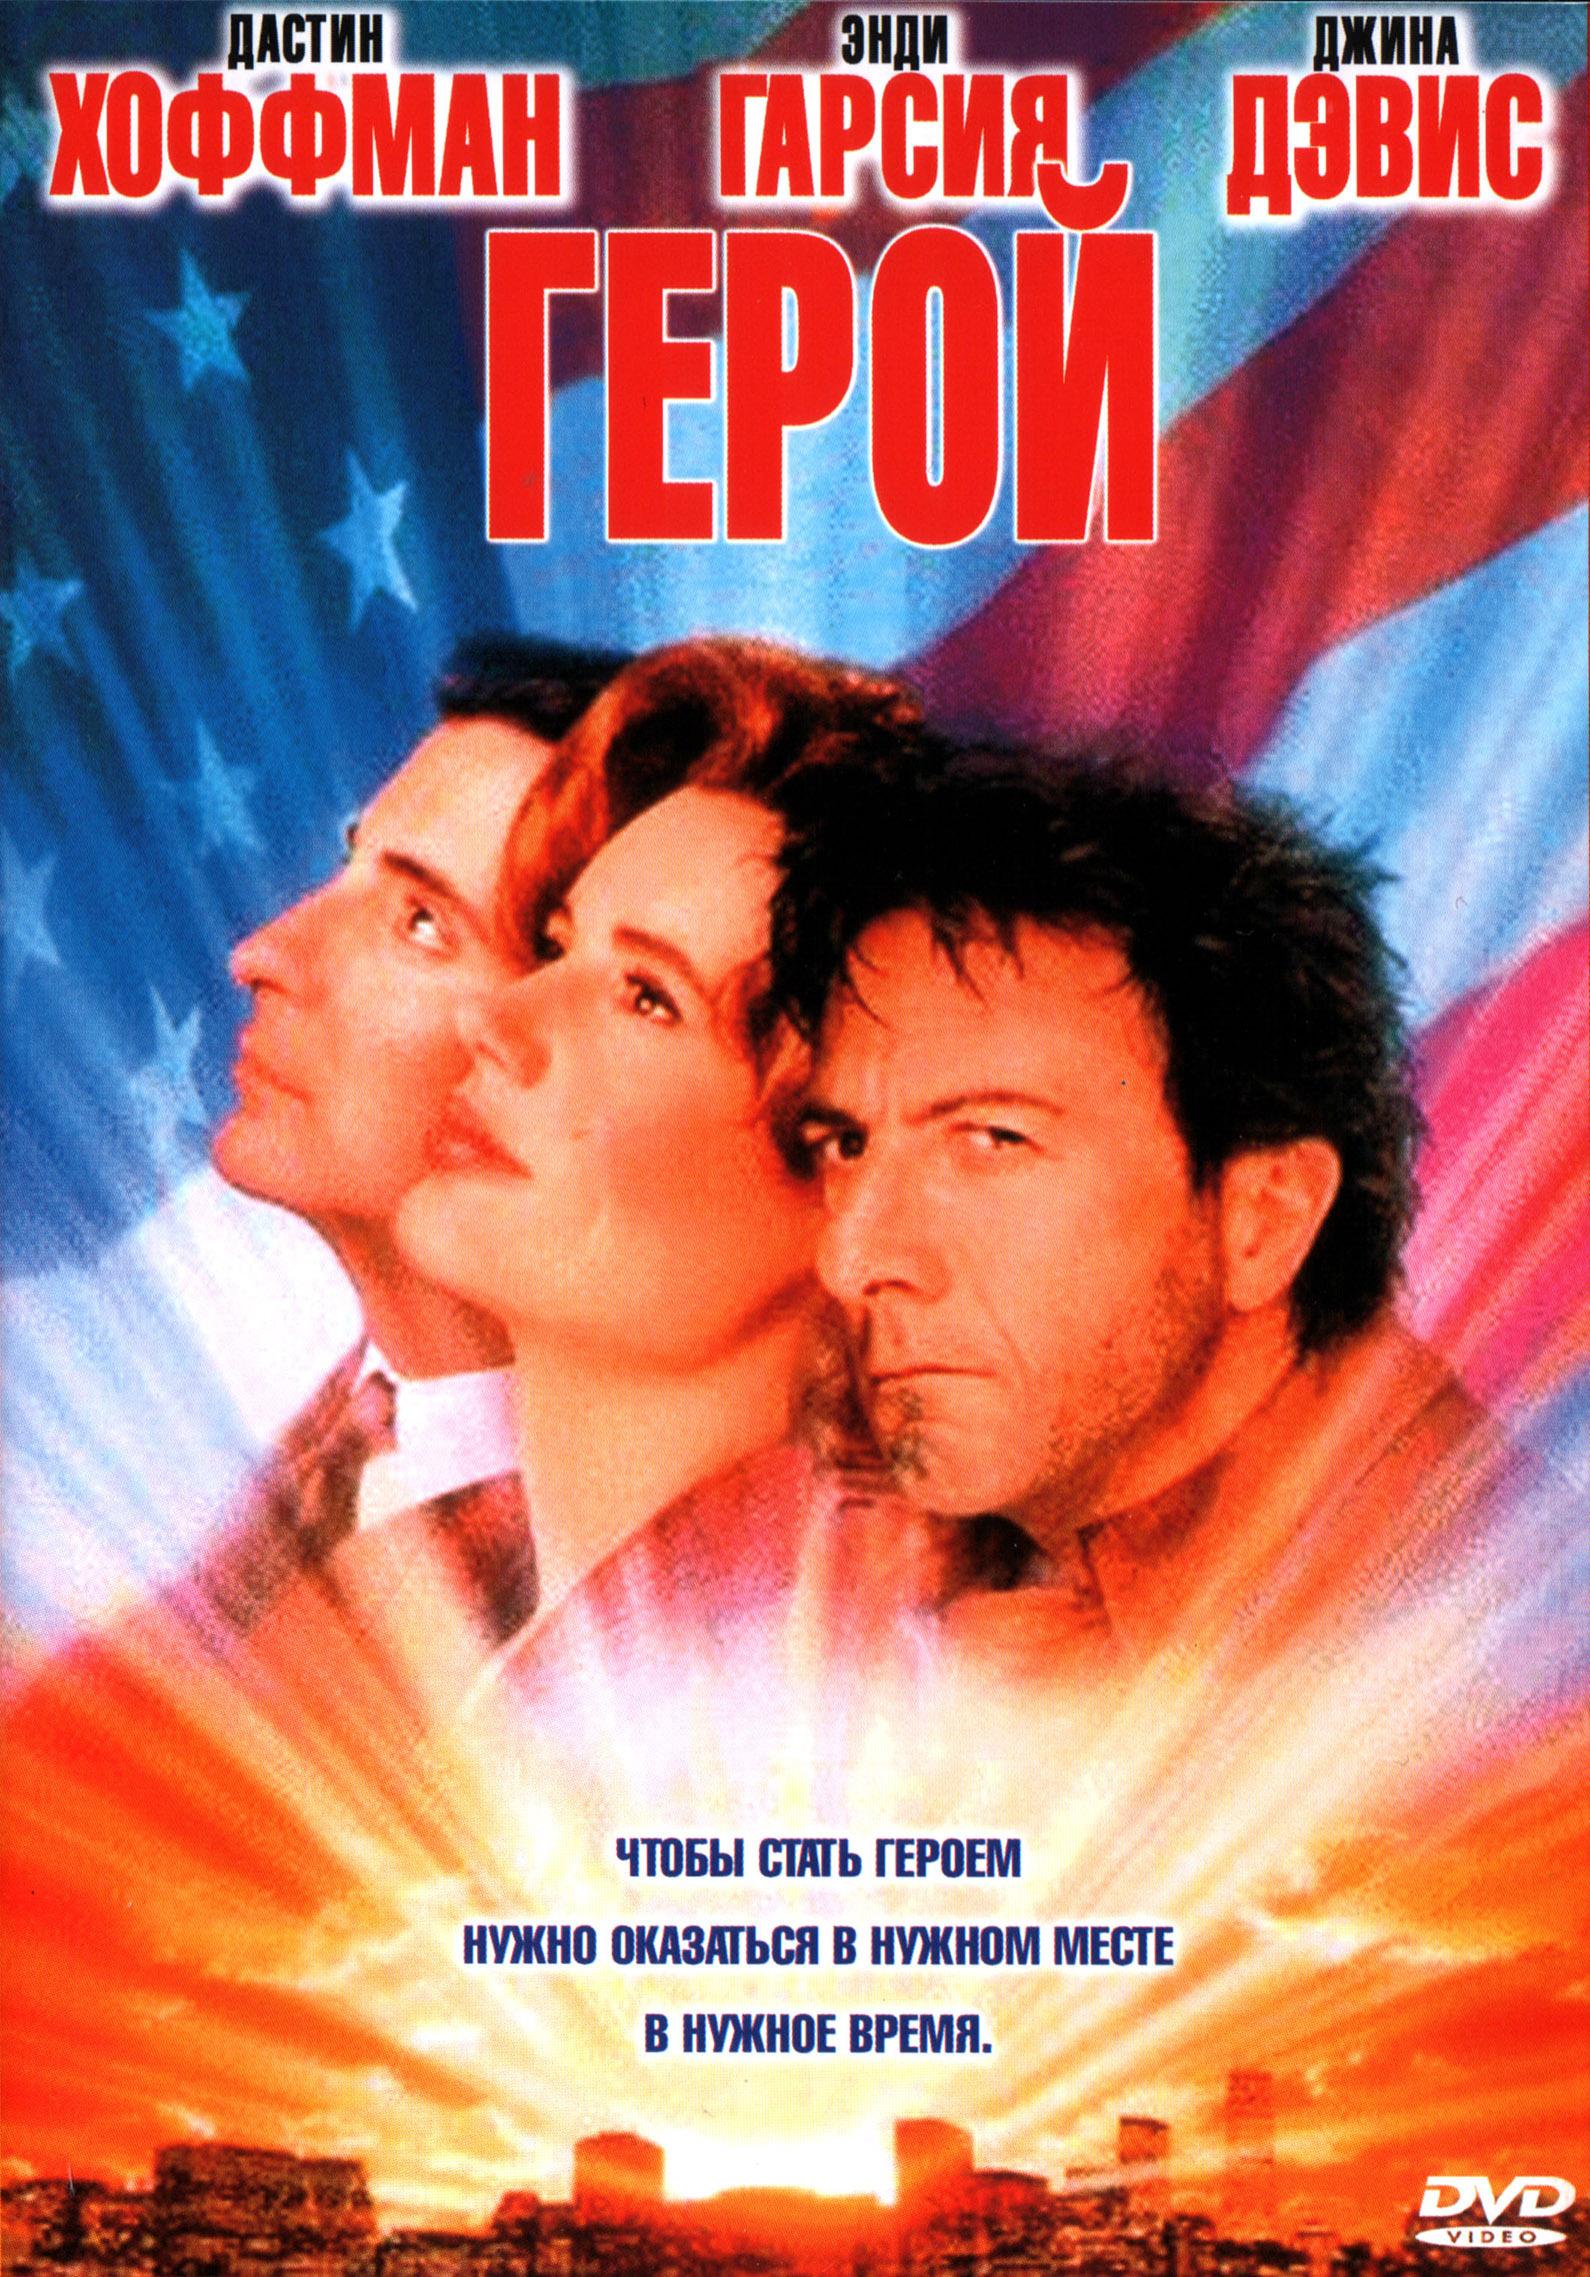 The hero movie poster